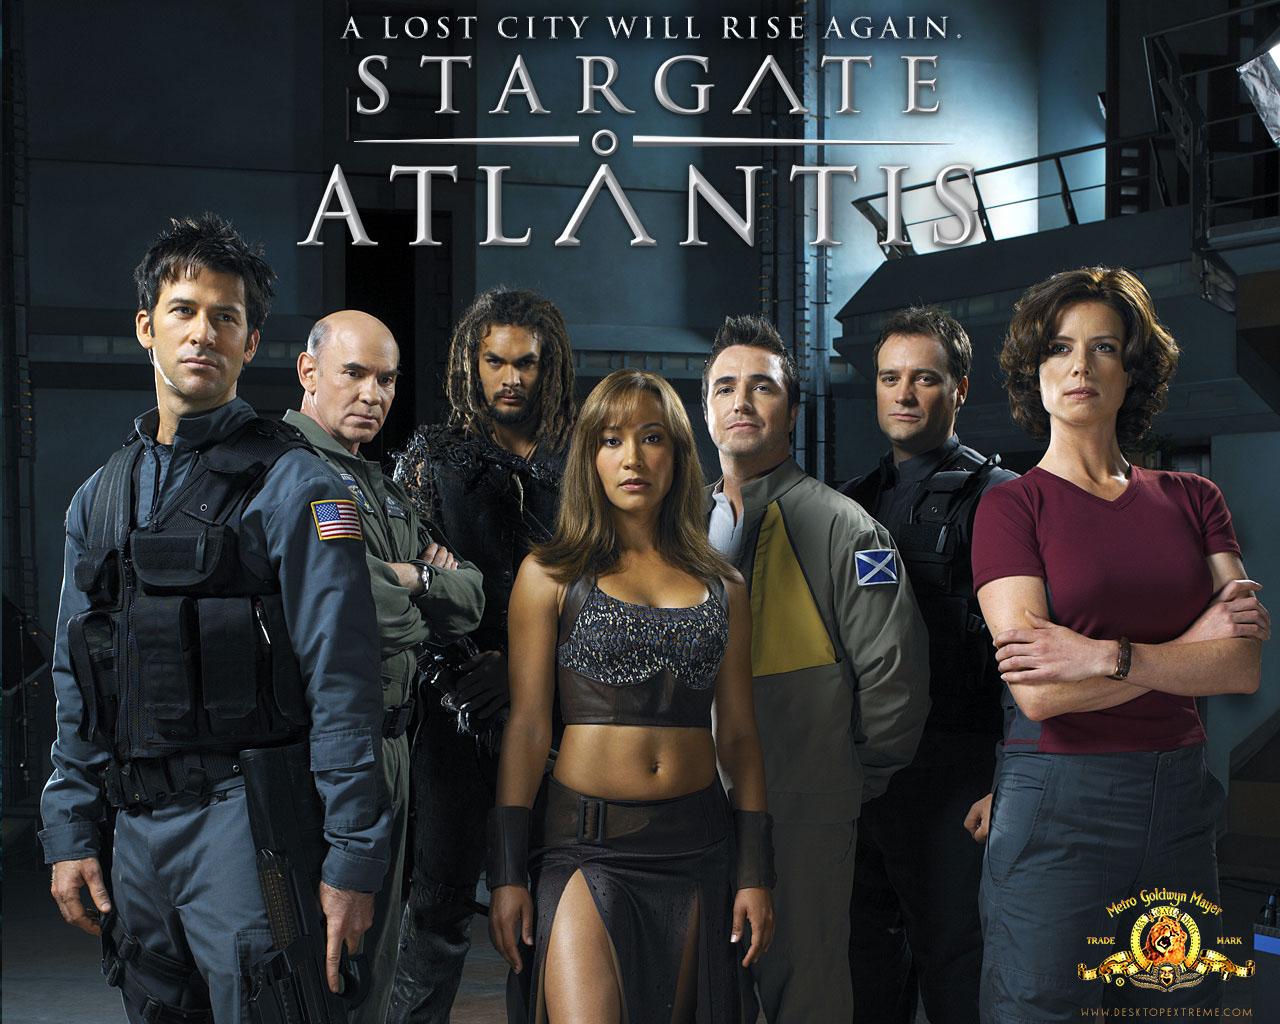 Return to the Stargate